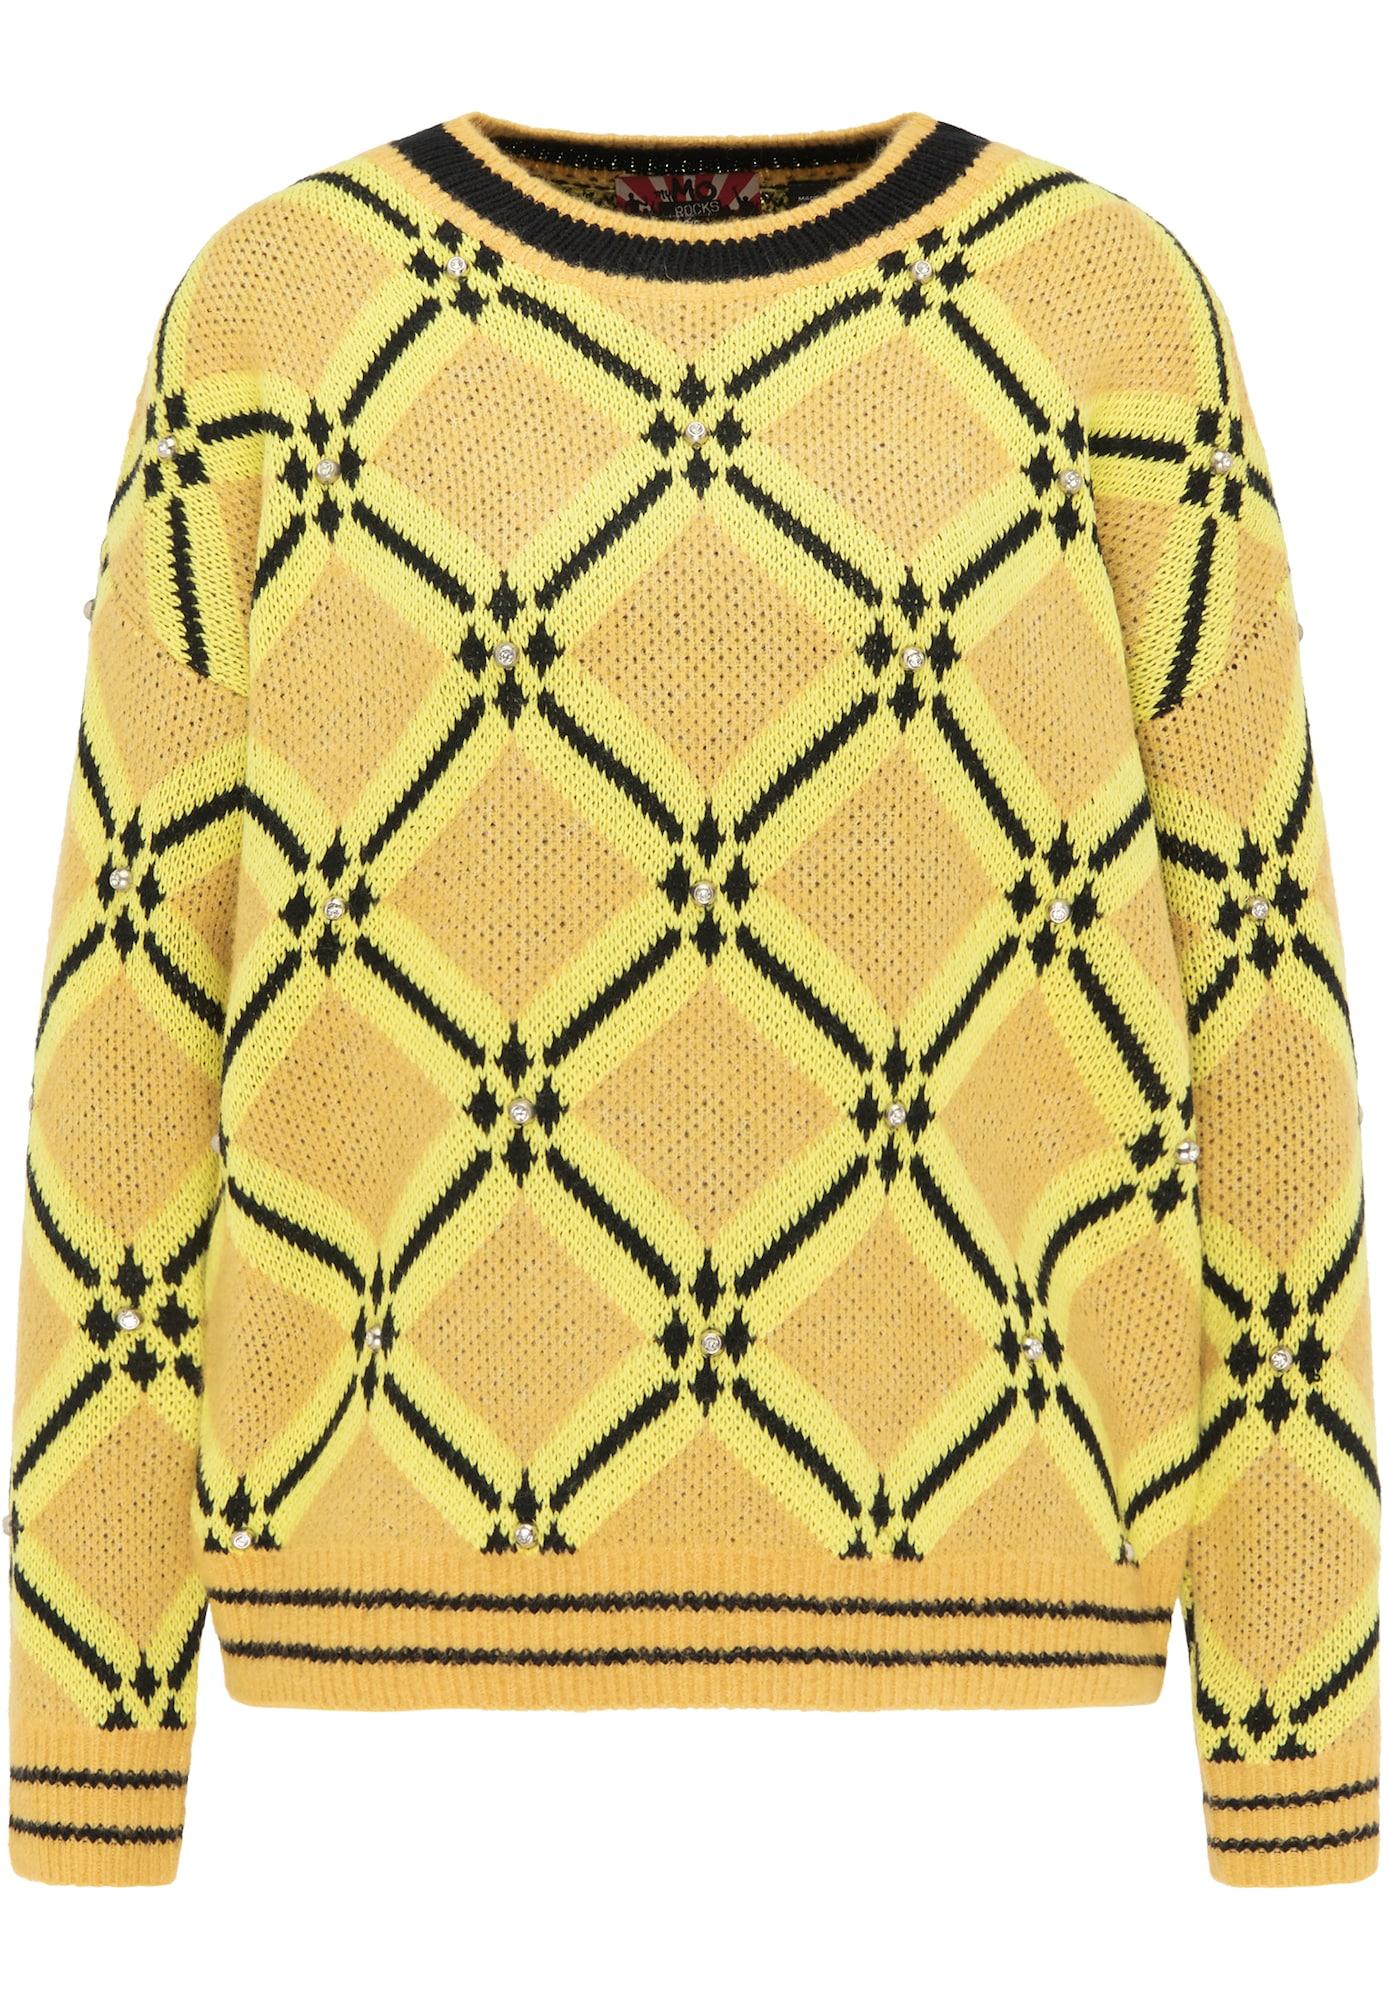 myMo ROCKS Megztinis geltona / aukso geltonumo spalva / juoda